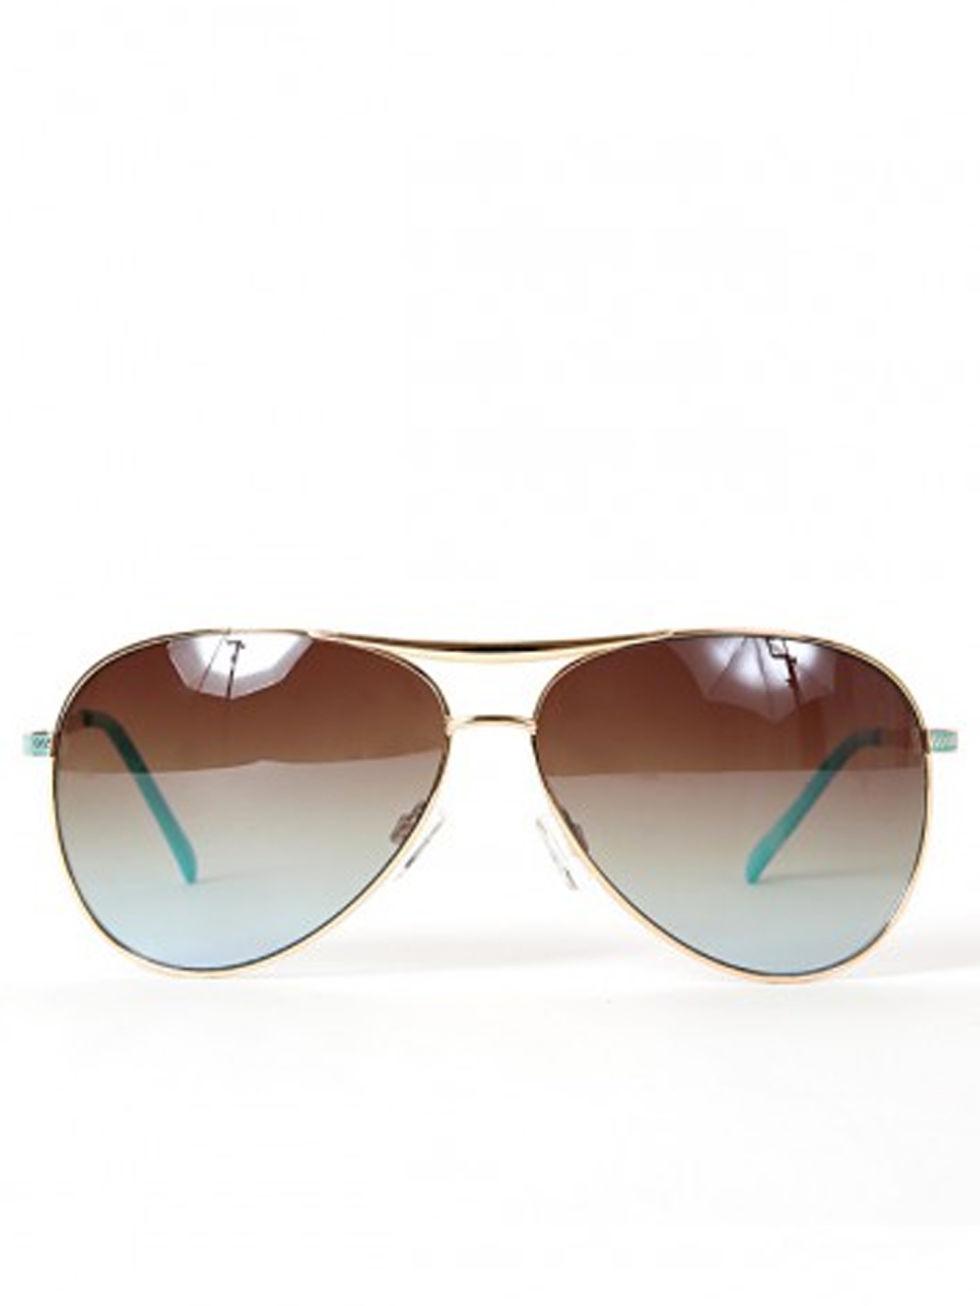 Sunglasses For Face Shape Quiz : Sunglasses For Face Shapes - Best Sunglasses for Your Face ...